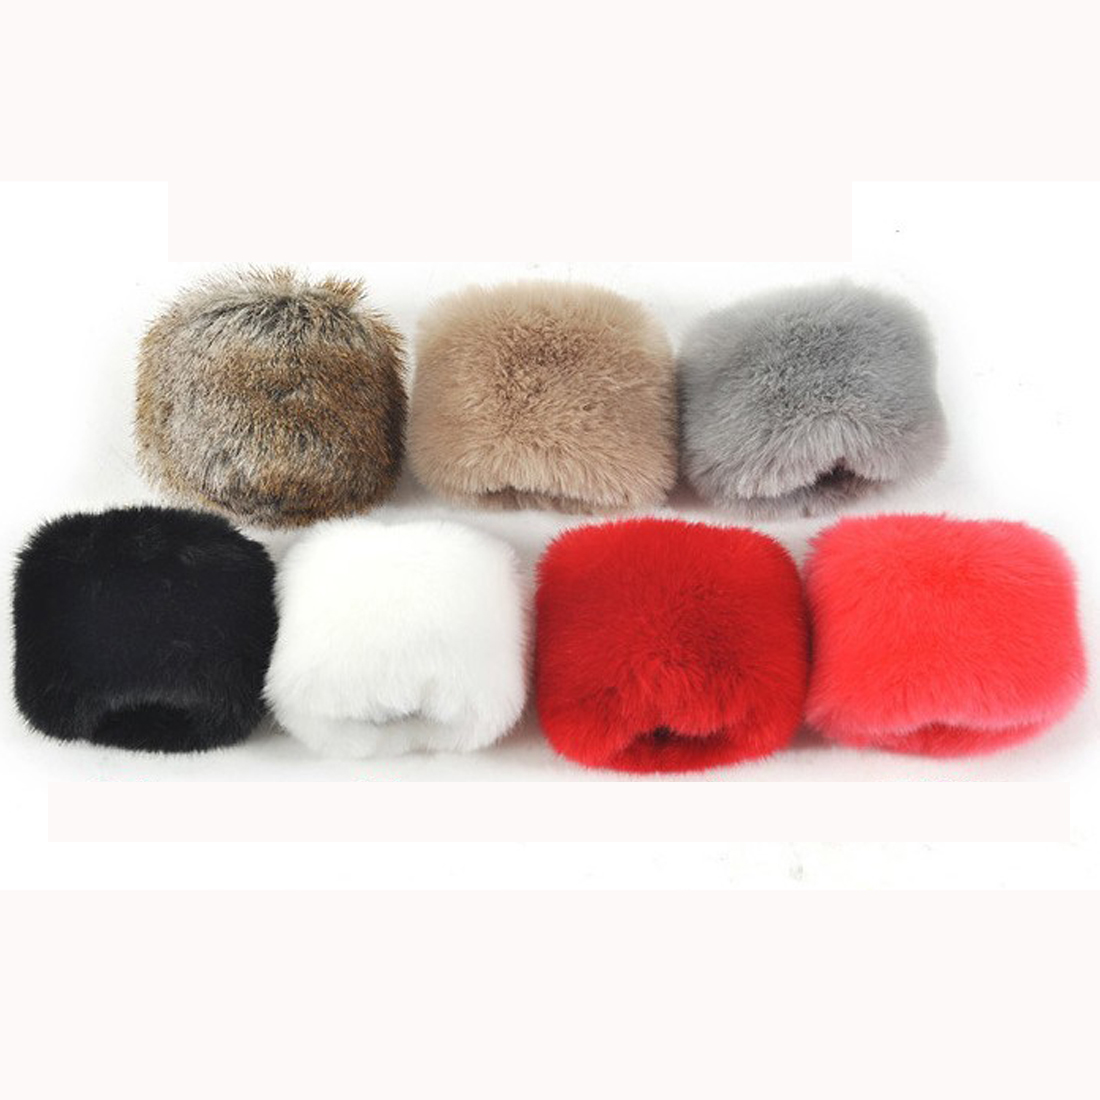 Hot Sale Winter Warm Women Arm Warmer Faux Fur Soft Elastic Wrist Slap On Cuffs Arm Warmer Plush Thicken Accessories Gray White